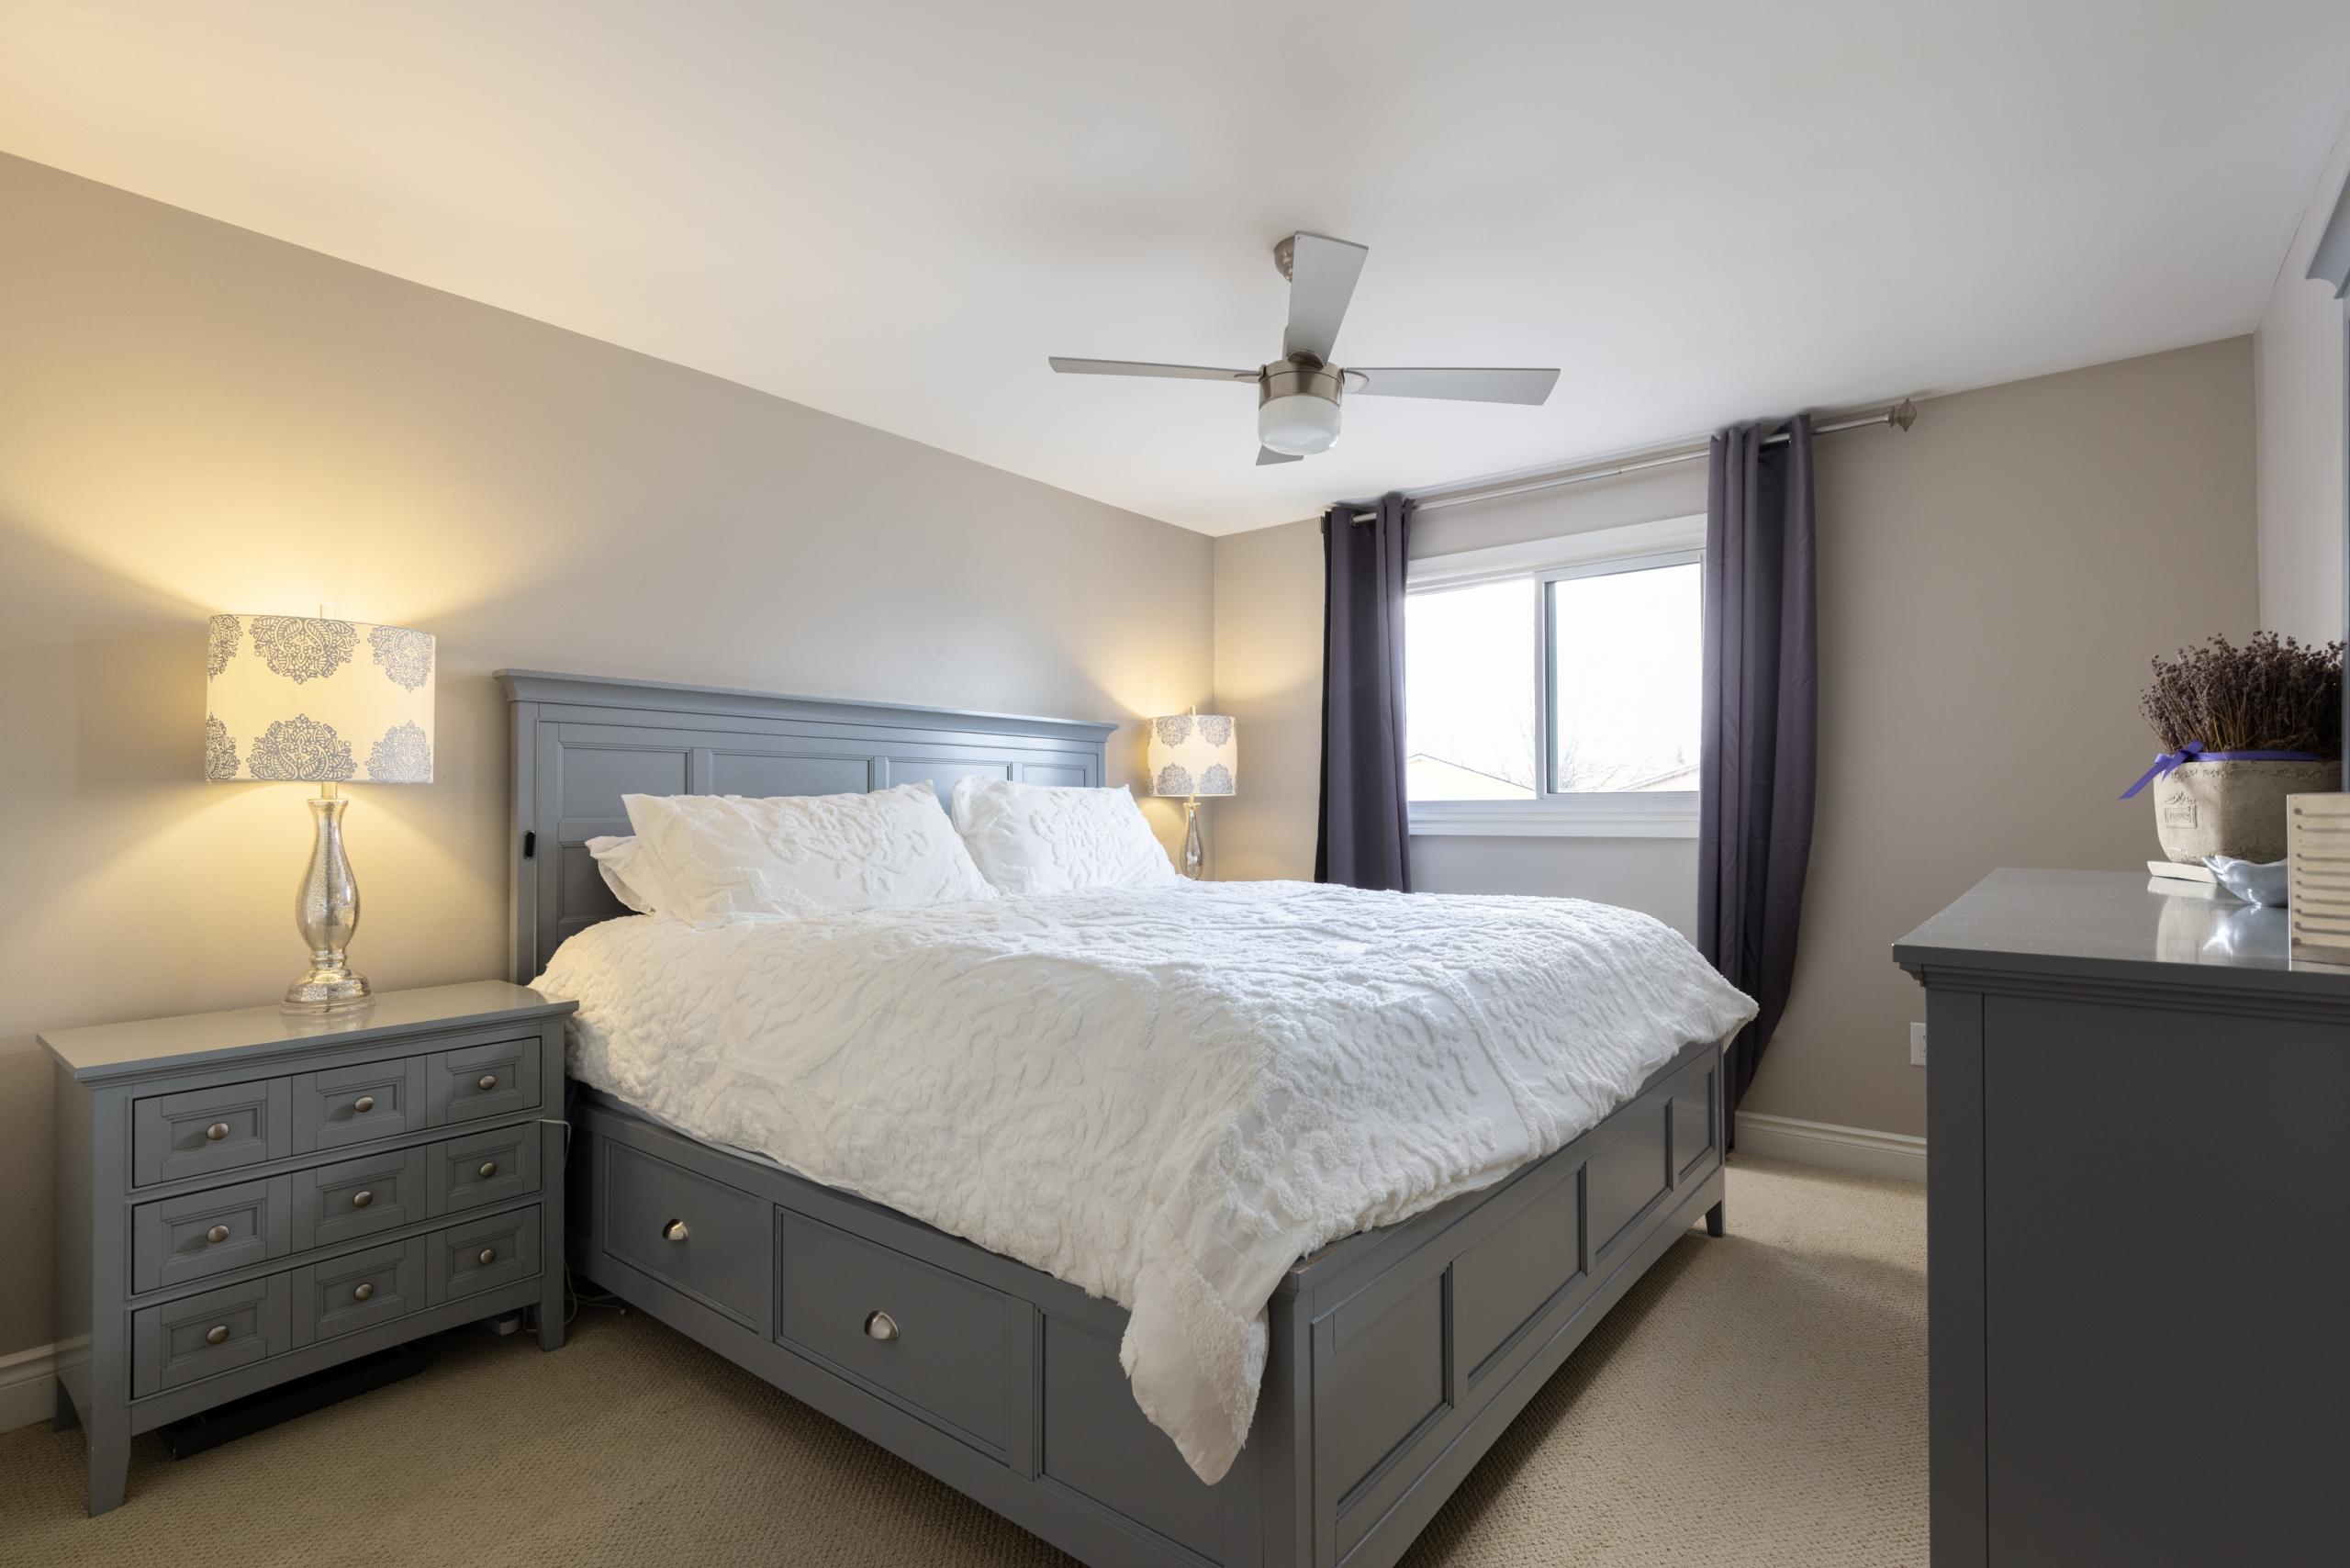 Bedroom featured at 3505 Quilter Court, Burlington, ON at Alex Irish & Associates